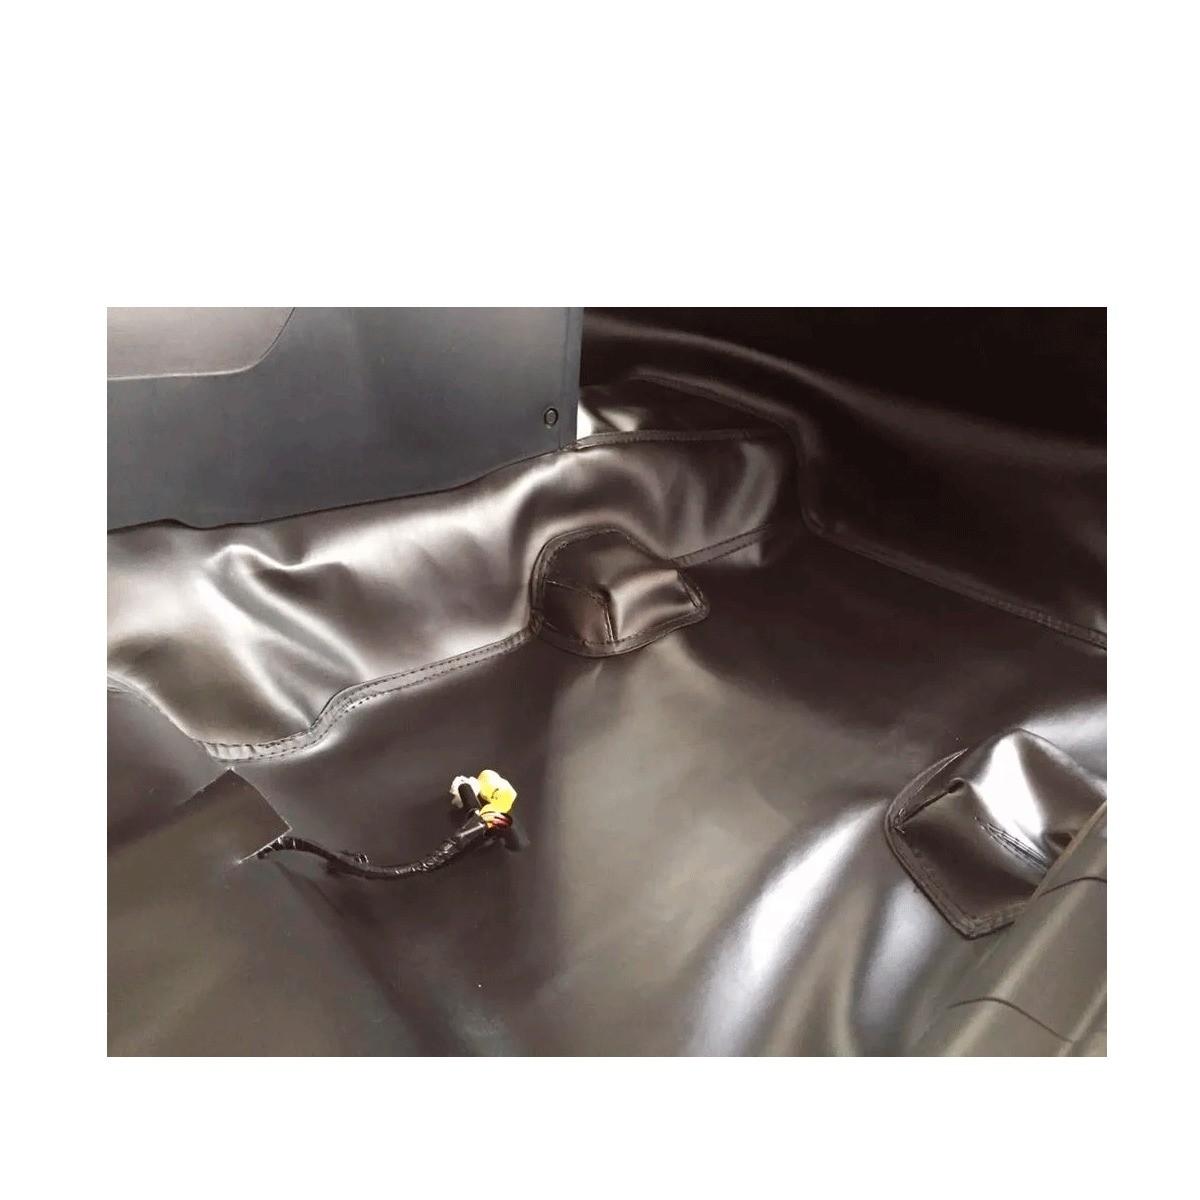 Tapete Automotivo Assoalho Emborrachado Bidim Ford Ranger Simples 2012 a 2020